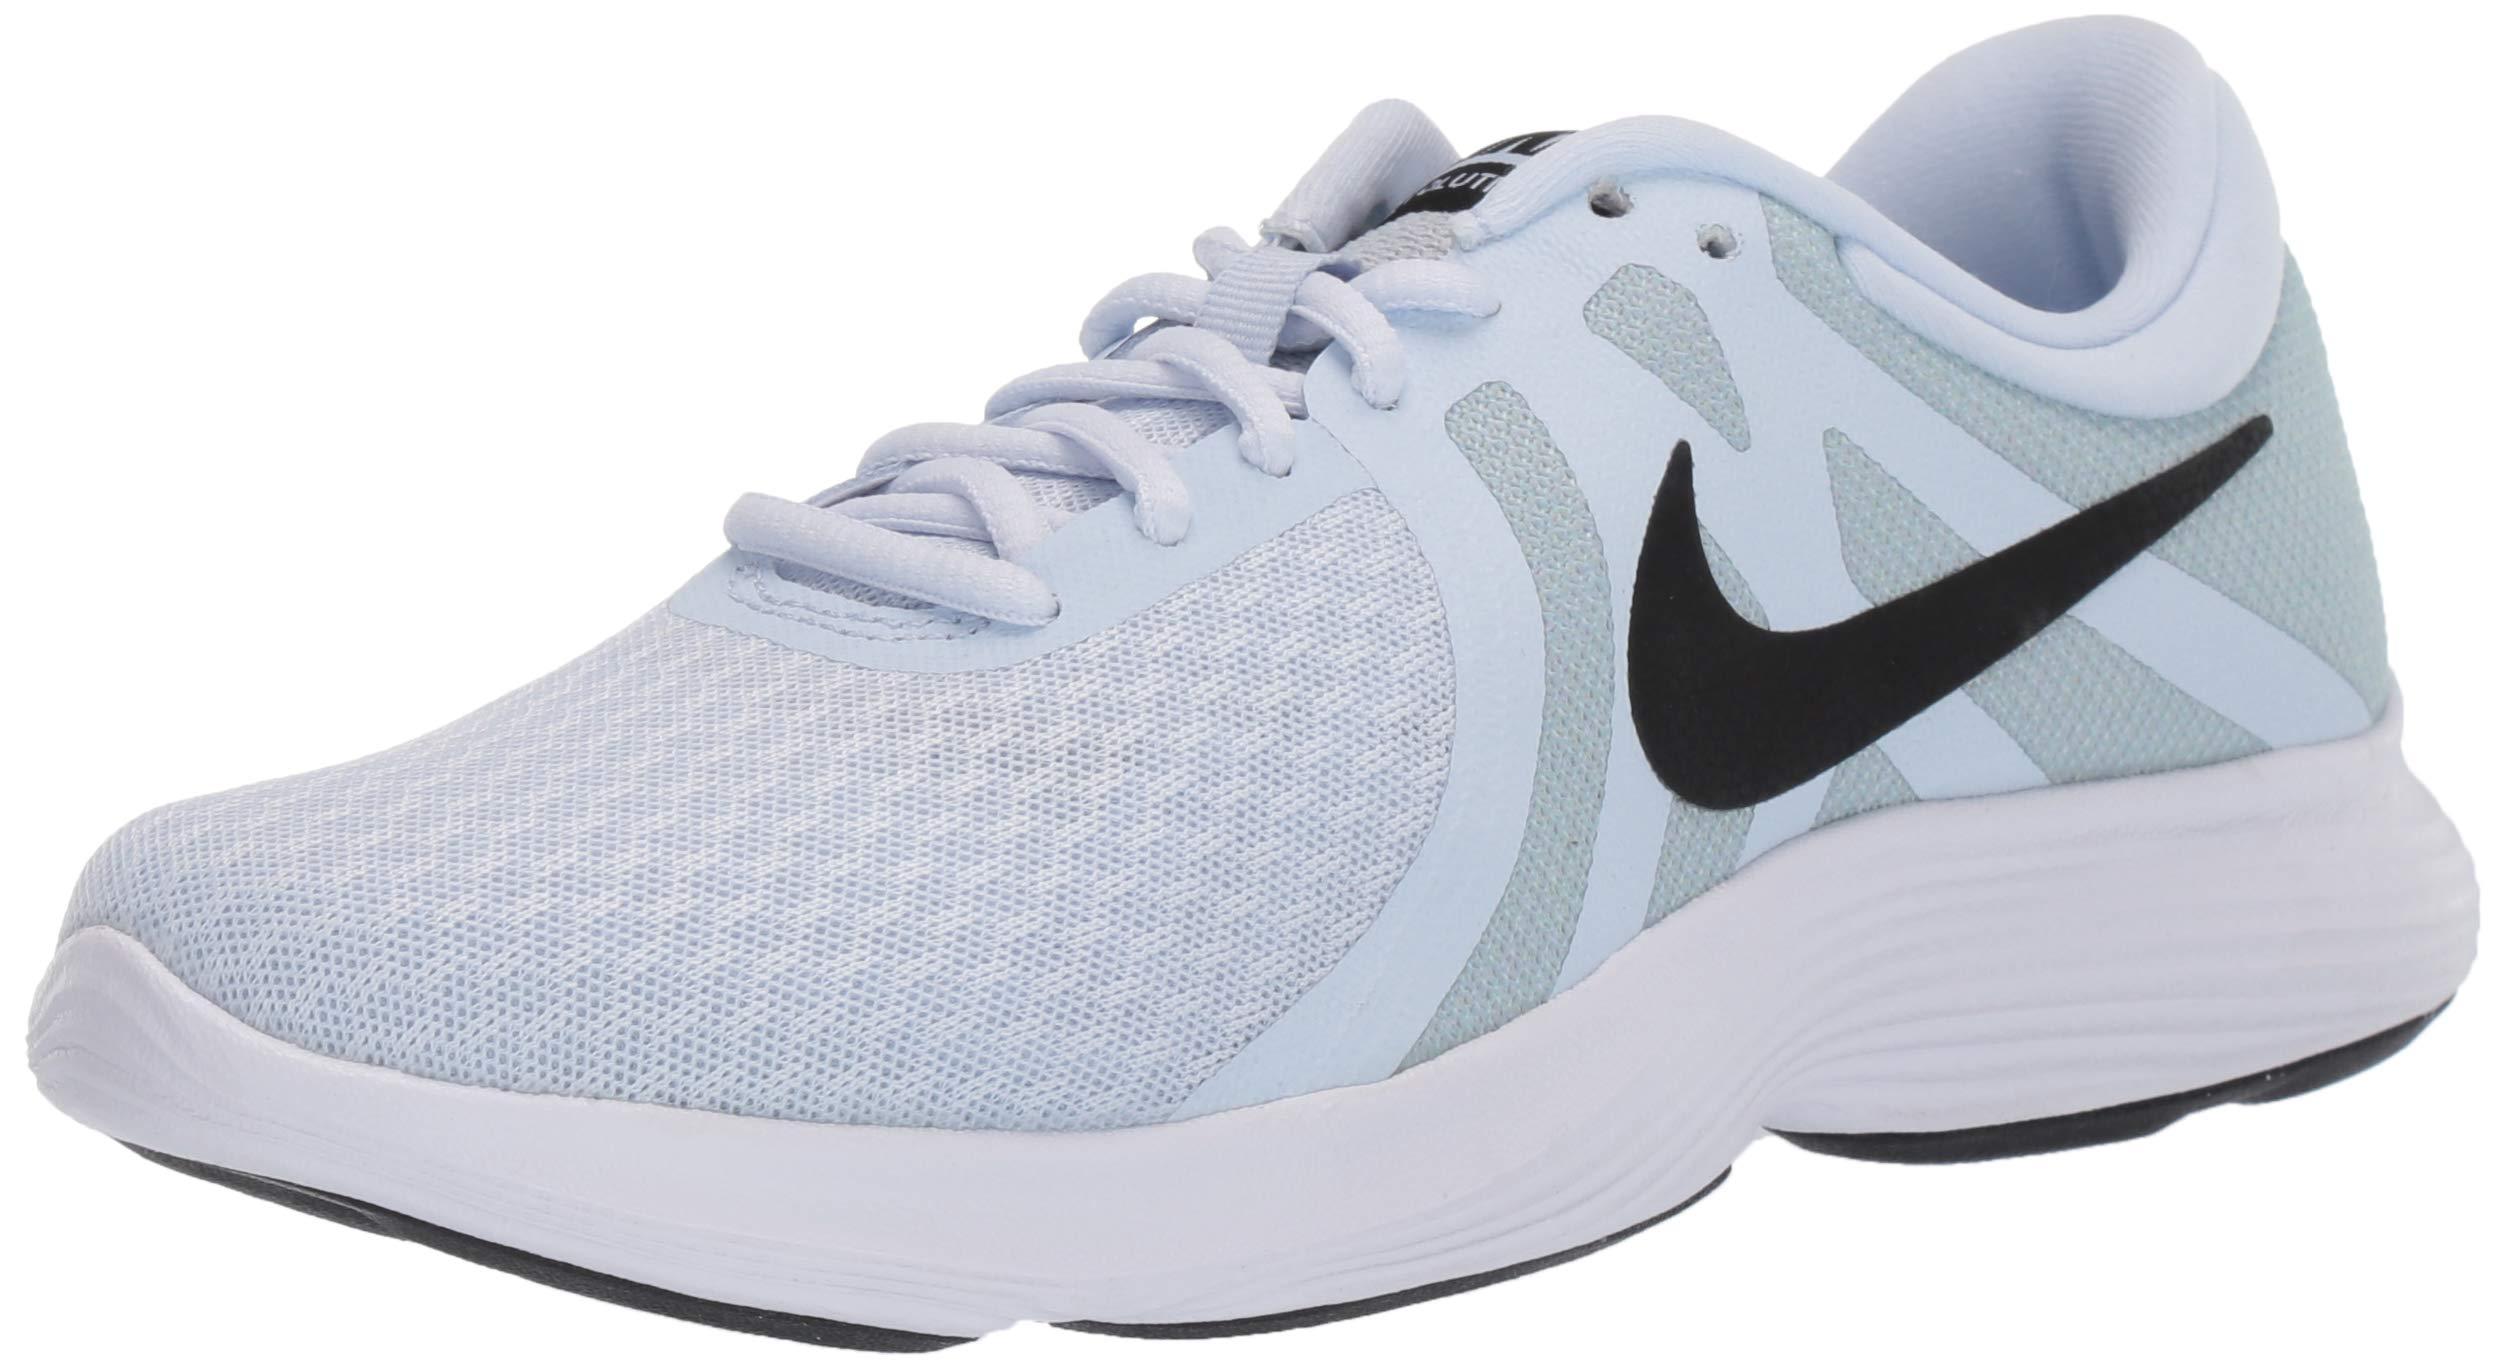 Nike Women's Revolution 4 Running Shoe, Half Blue/Black - Wolf Grey - White, 5 Regular US